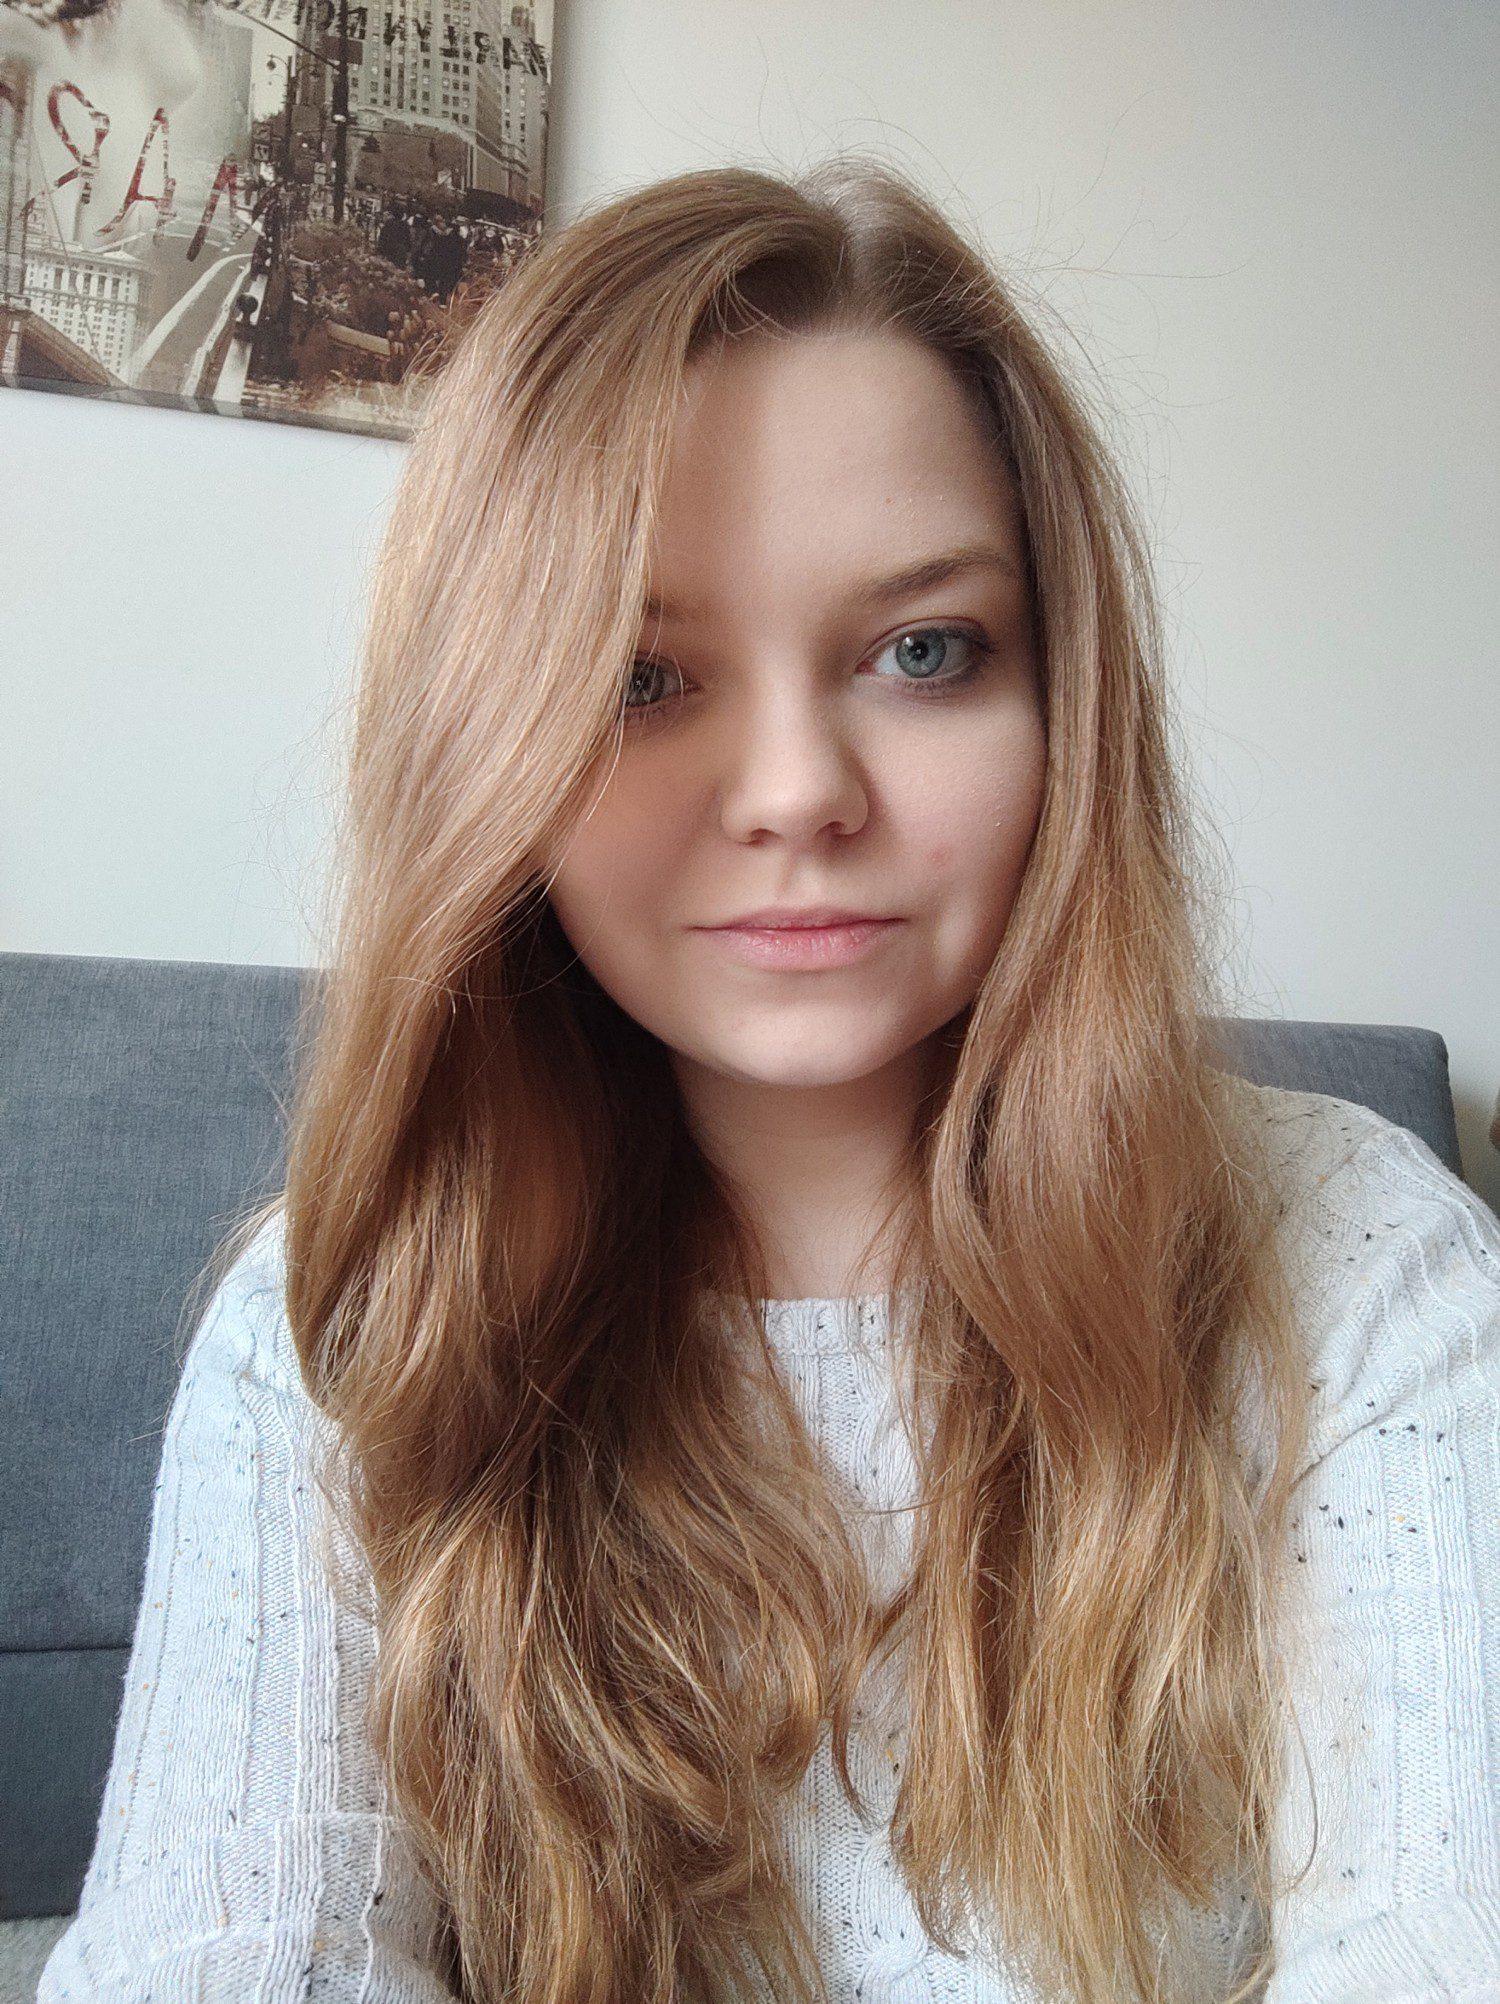 standardowe selfie mi 11